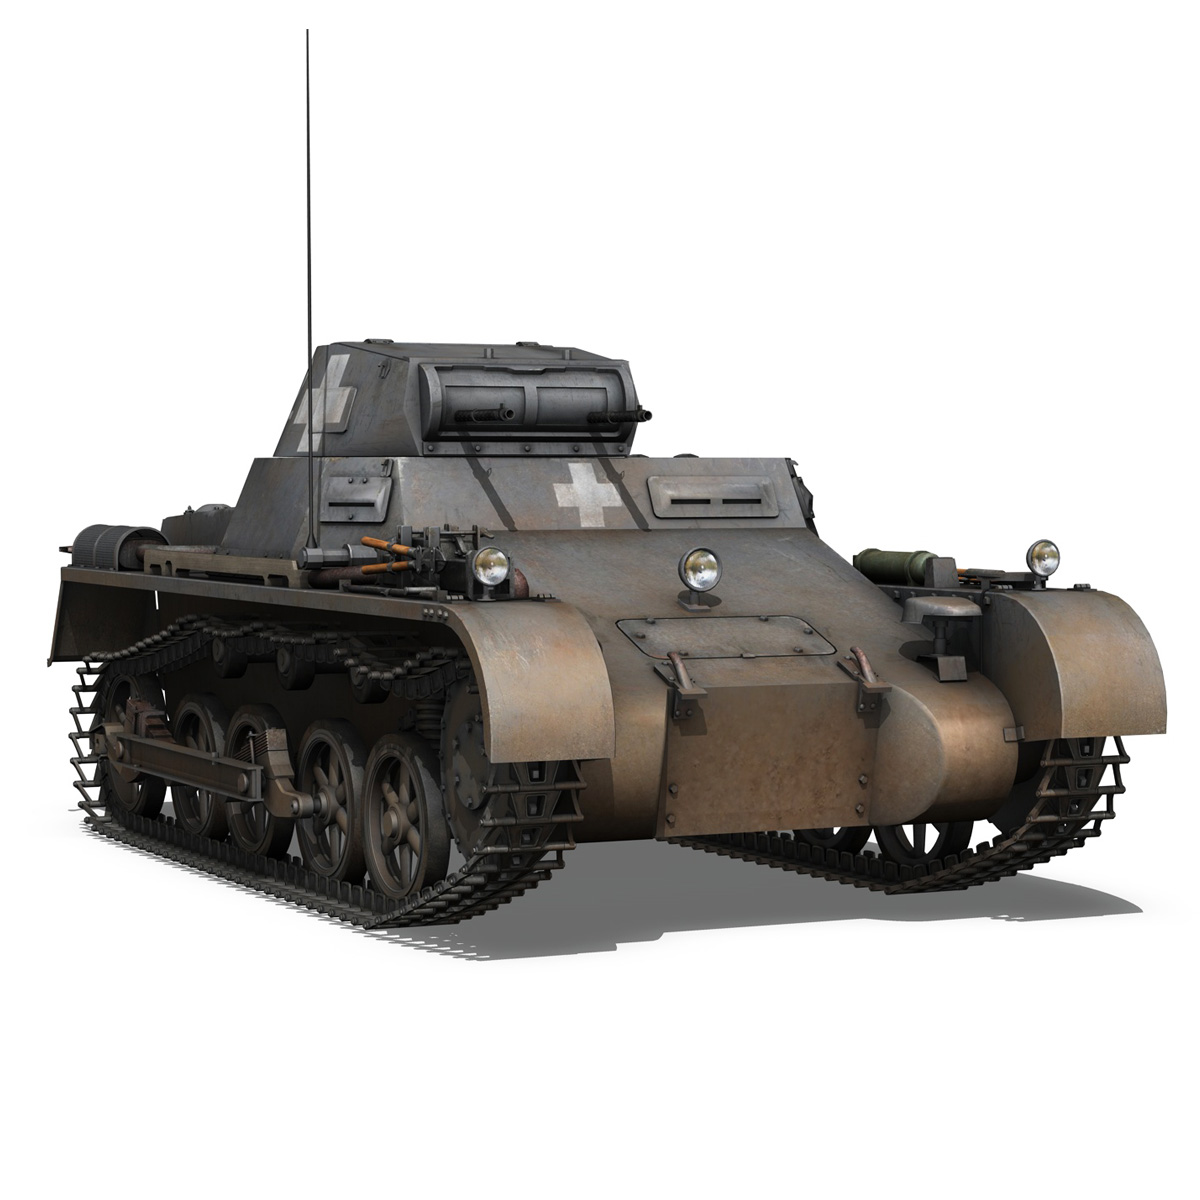 pzkpfw 1 - Panzer 1 - ausf. a - 22 3d modell 3ds fbx c4d lwo obj 186932